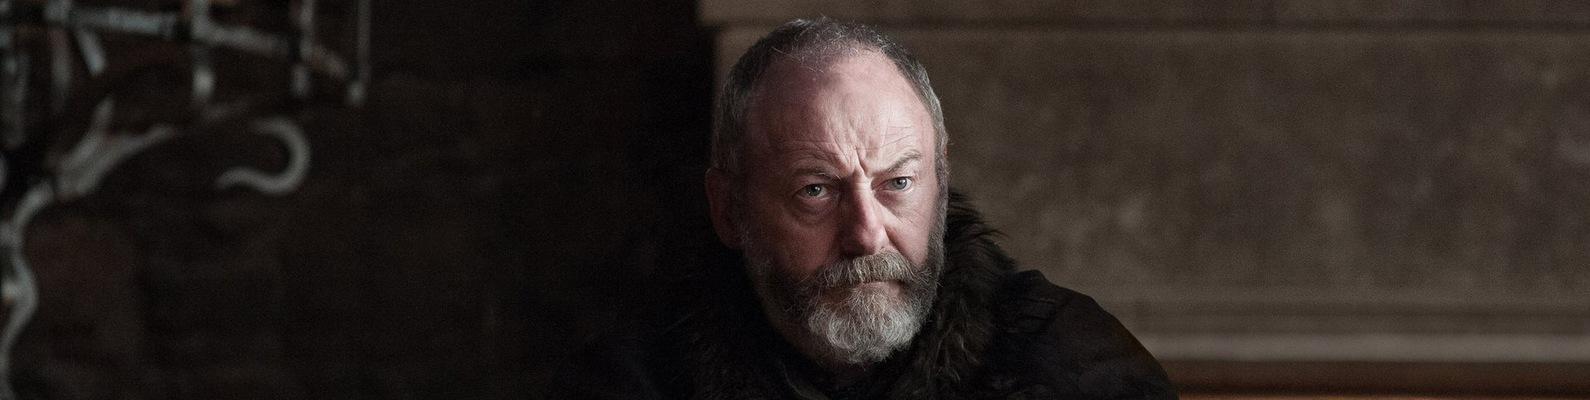 Game Of Thrones Stream English Free